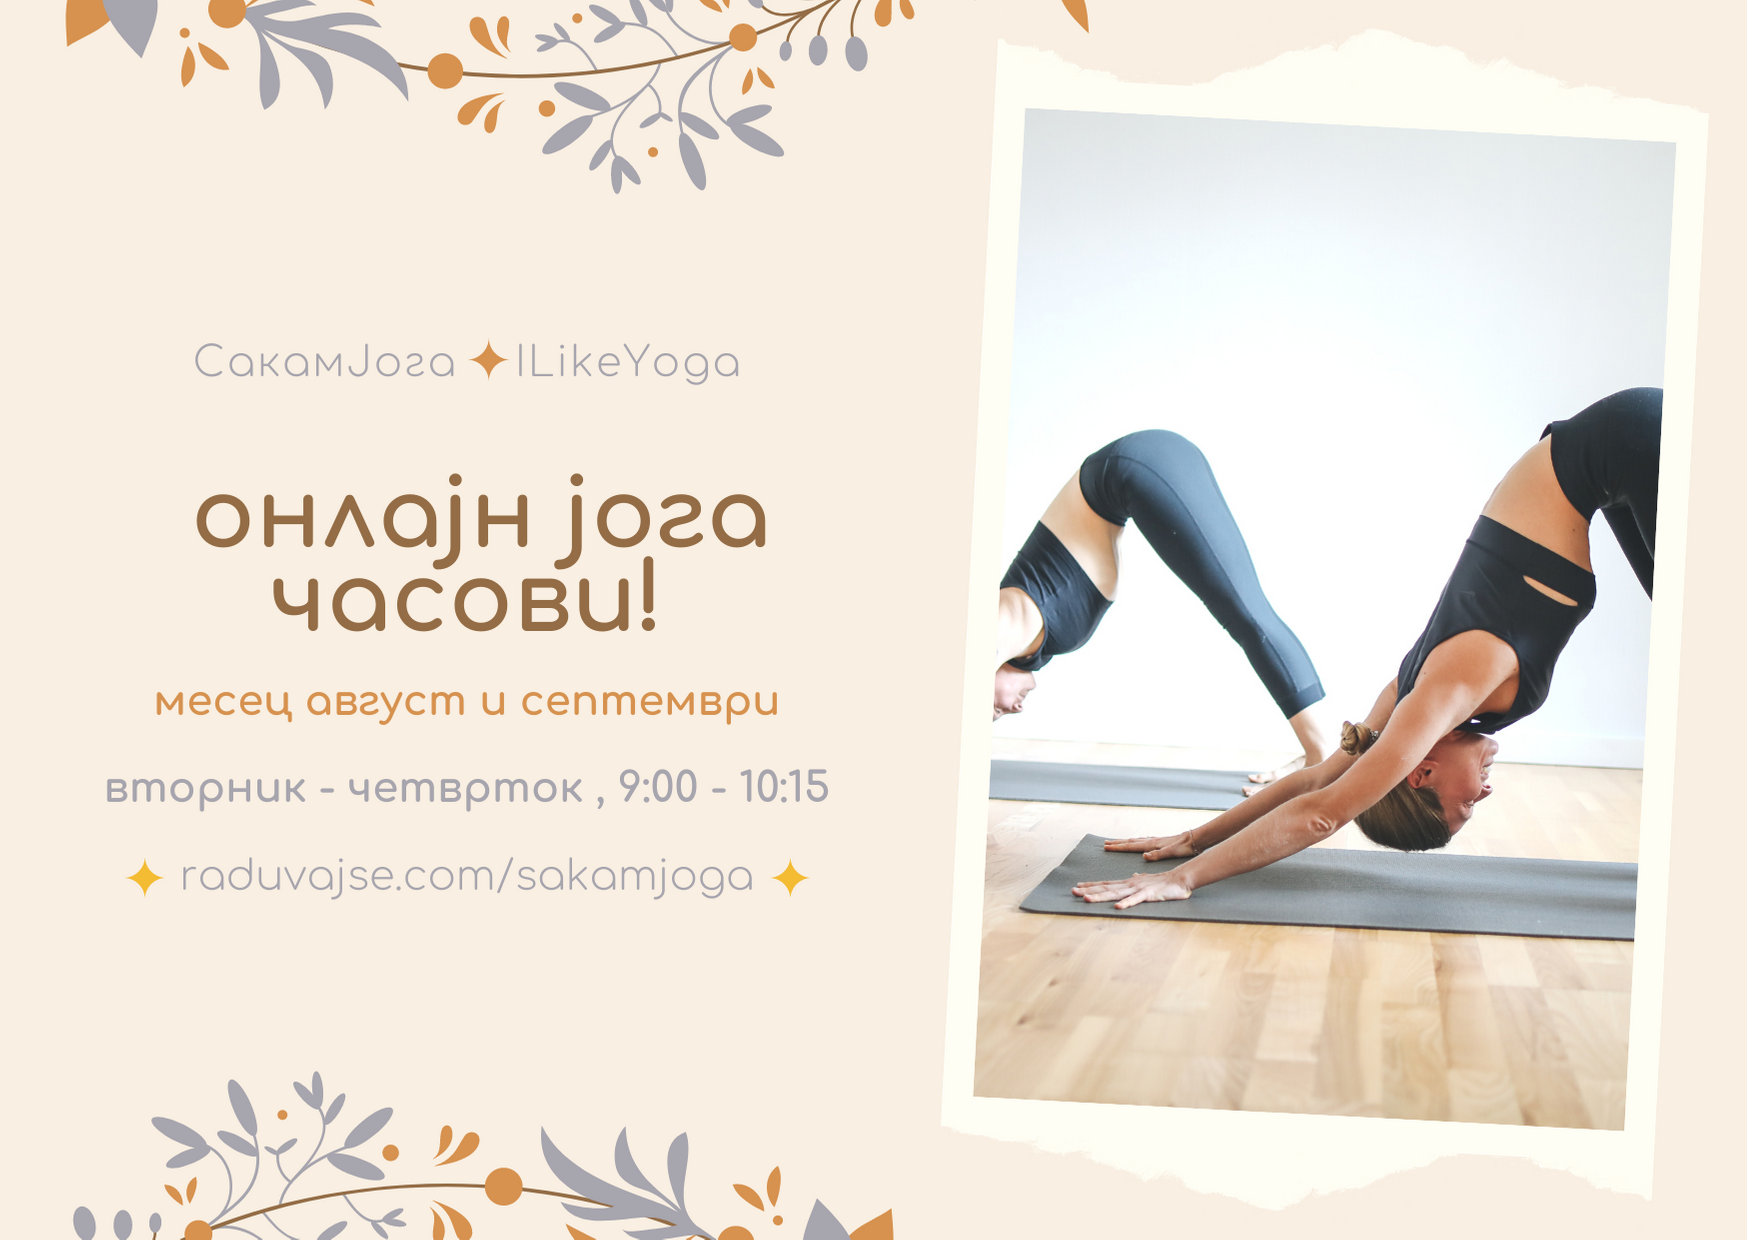 Online Yoga Classess